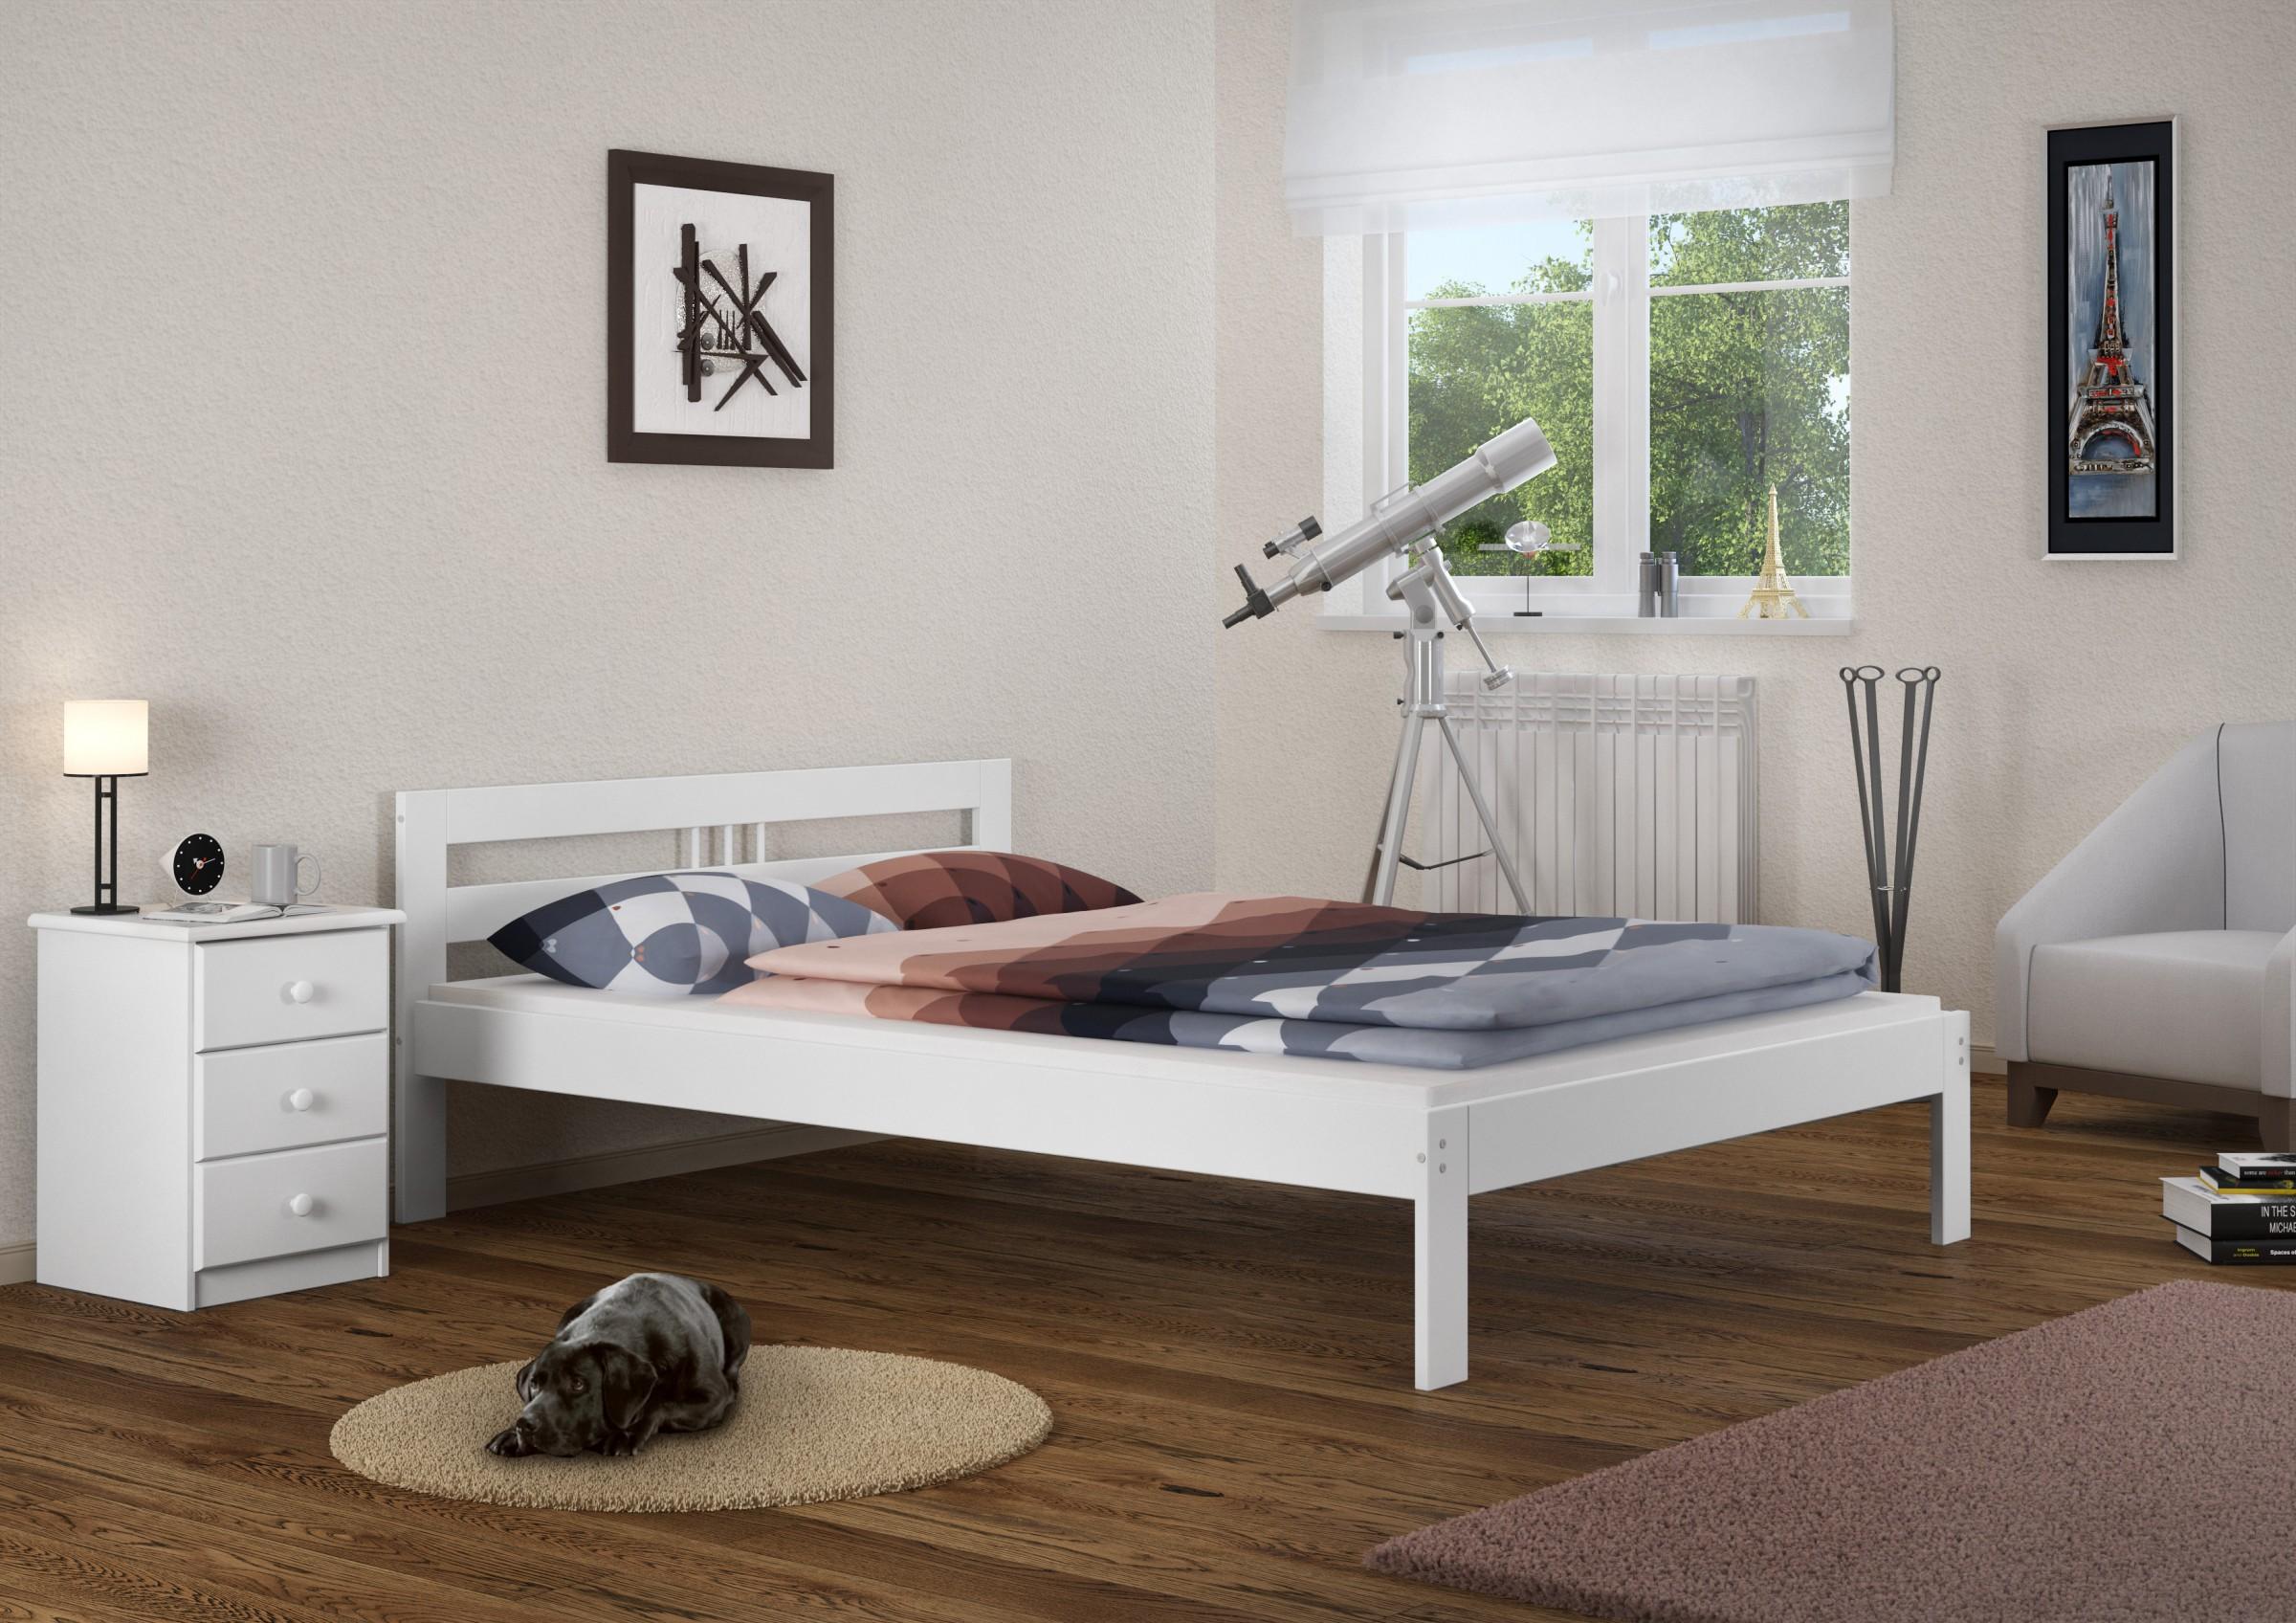 massivholzbett weiss kiefer jugendbett 120x200 futonbett mit rollrost w ebay. Black Bedroom Furniture Sets. Home Design Ideas